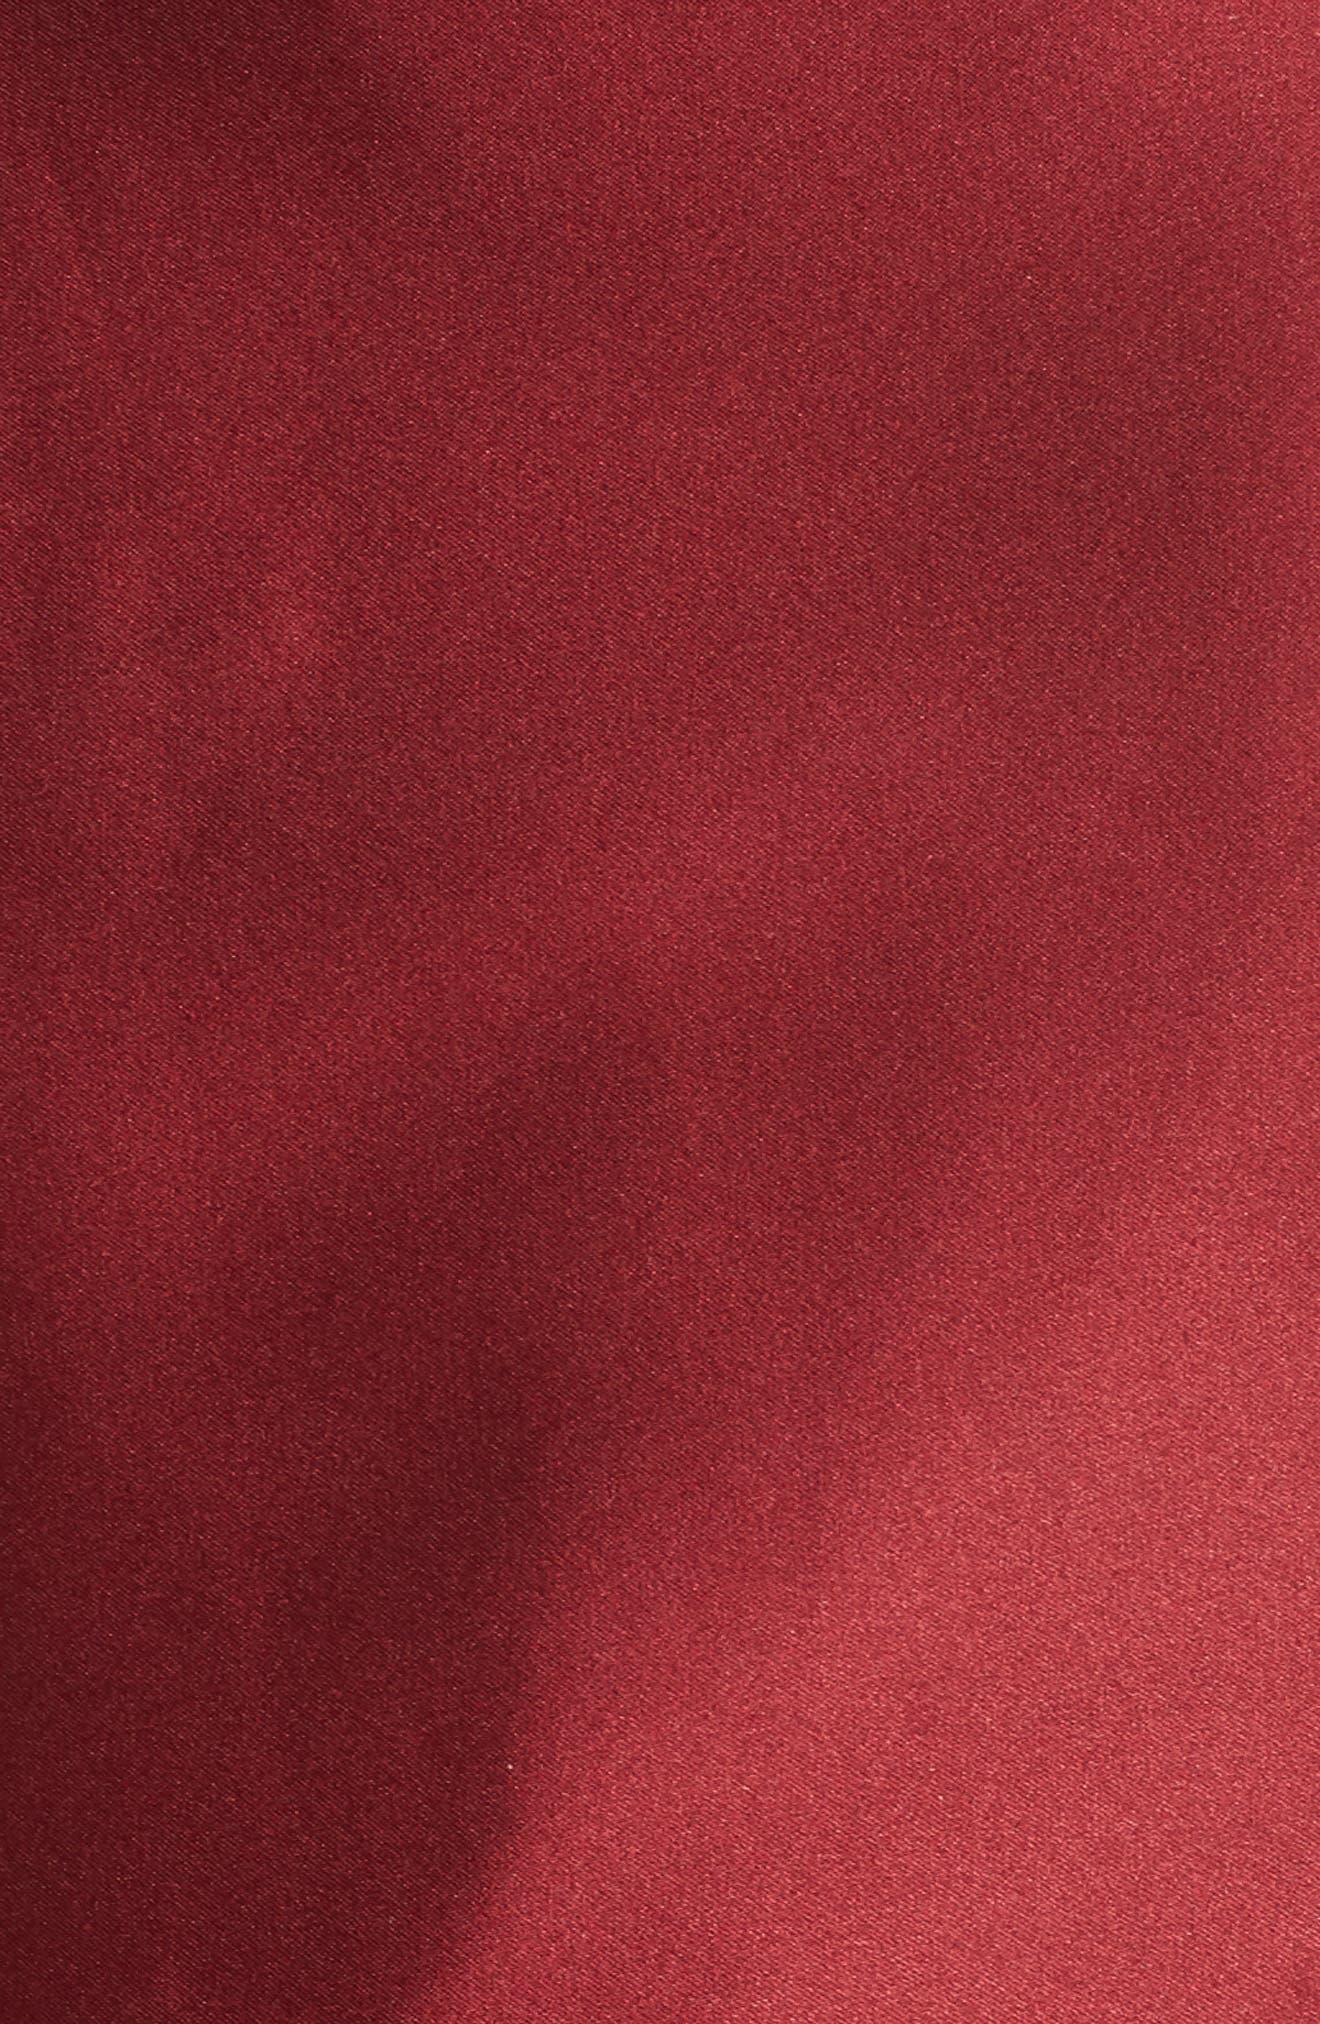 Satin Halter Neck Party Dress,                             Alternate thumbnail 6, color,                             BURGUNDY